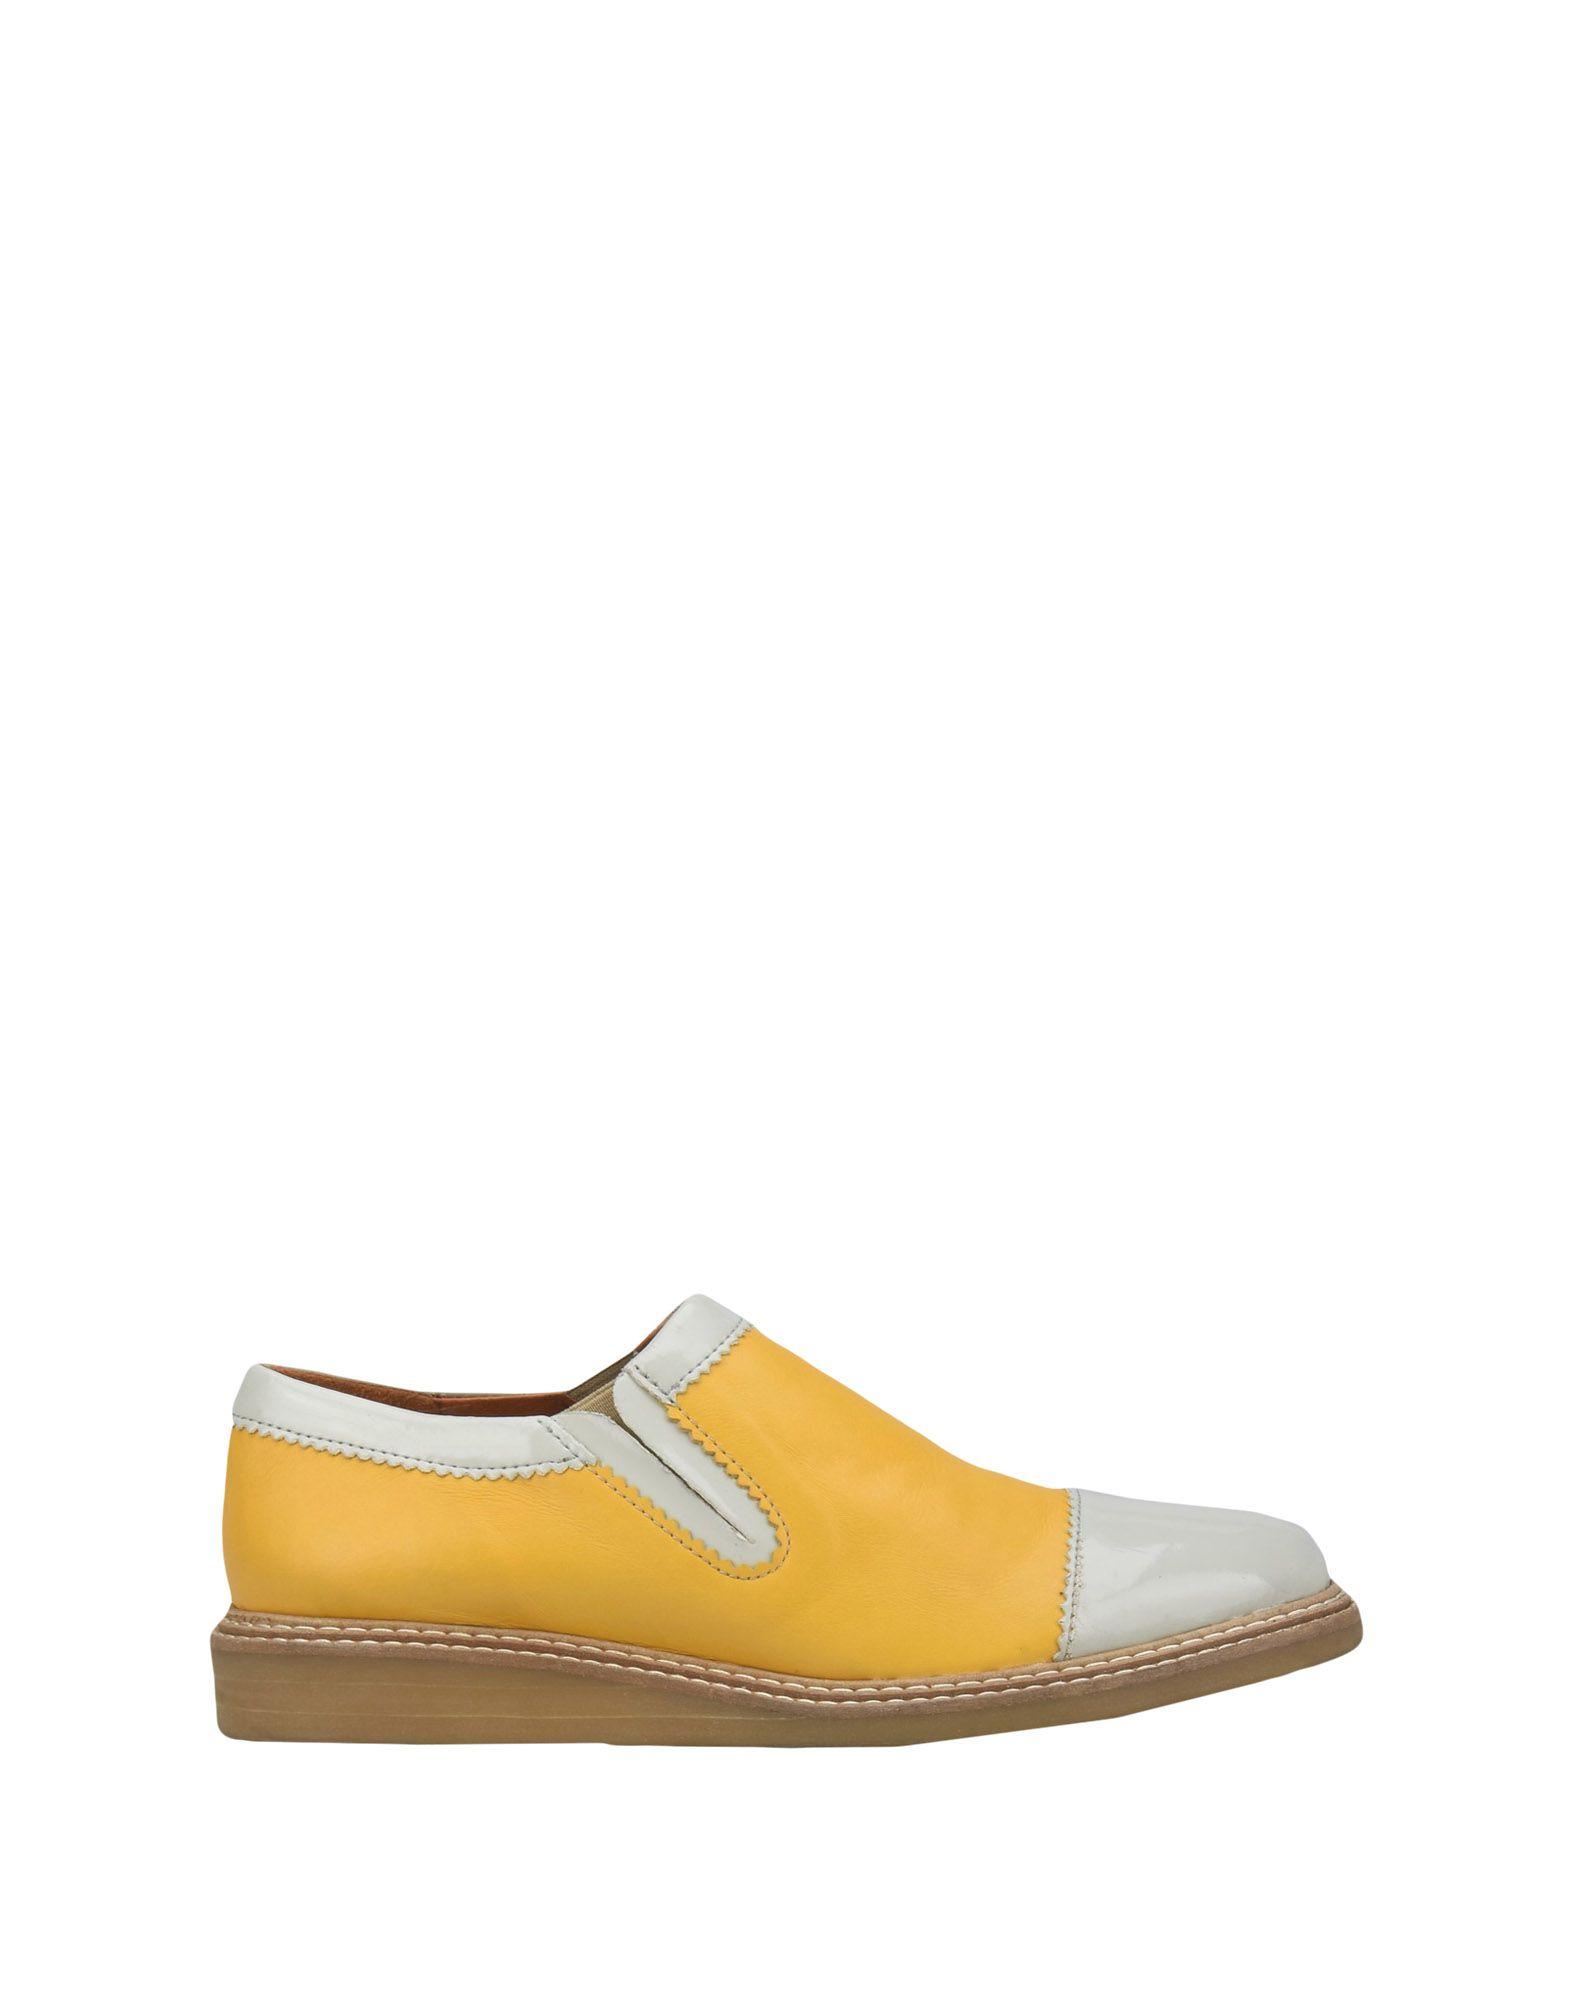 Gut tragenMaison um billige Schuhe zu tragenMaison Gut Shoeshibar Chic  11226628OW 19ddb8